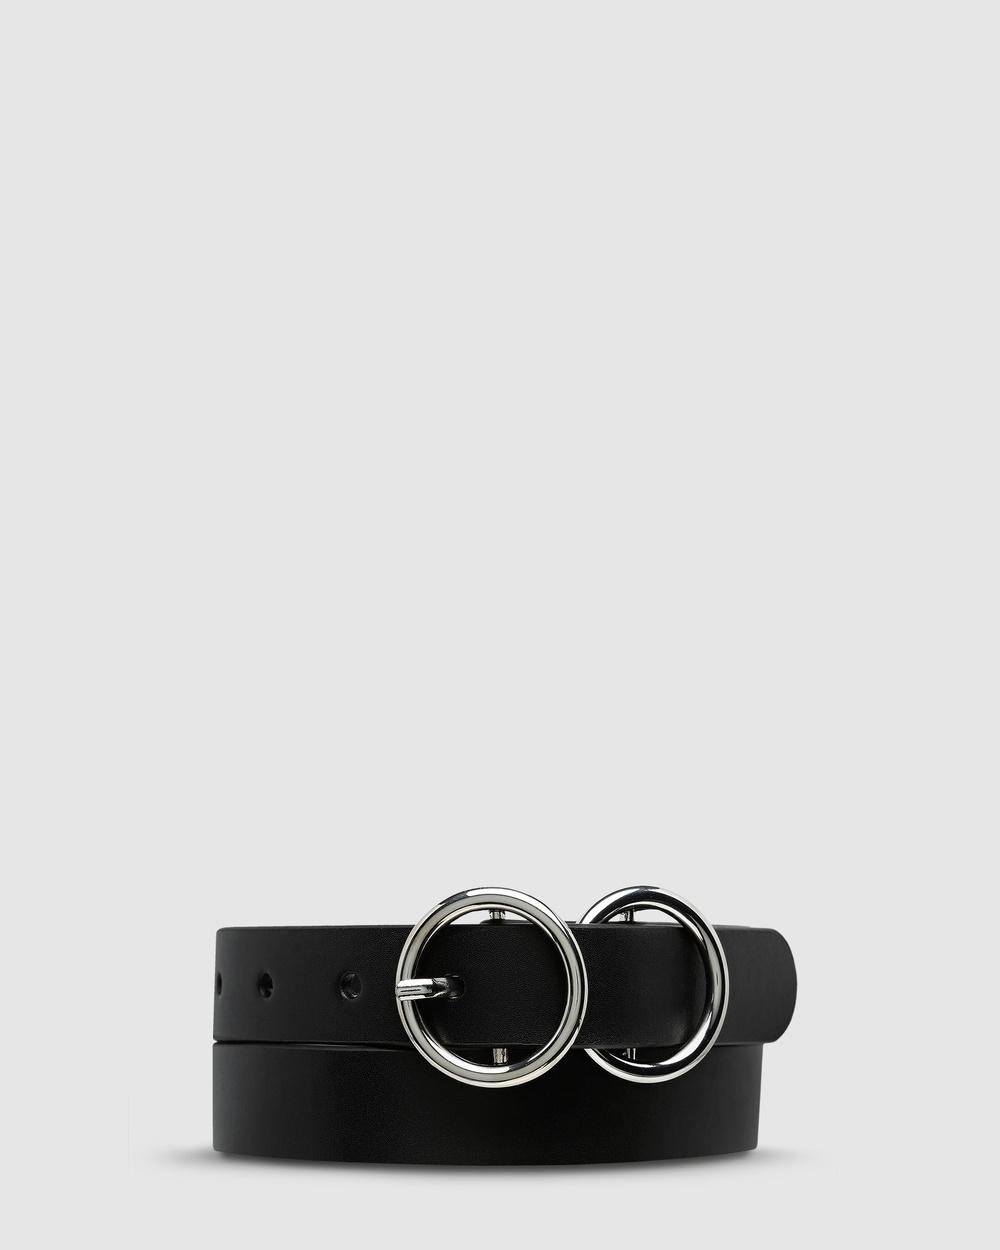 Status Anxiety Mislaid Skinny Belt Belts Black/Silver